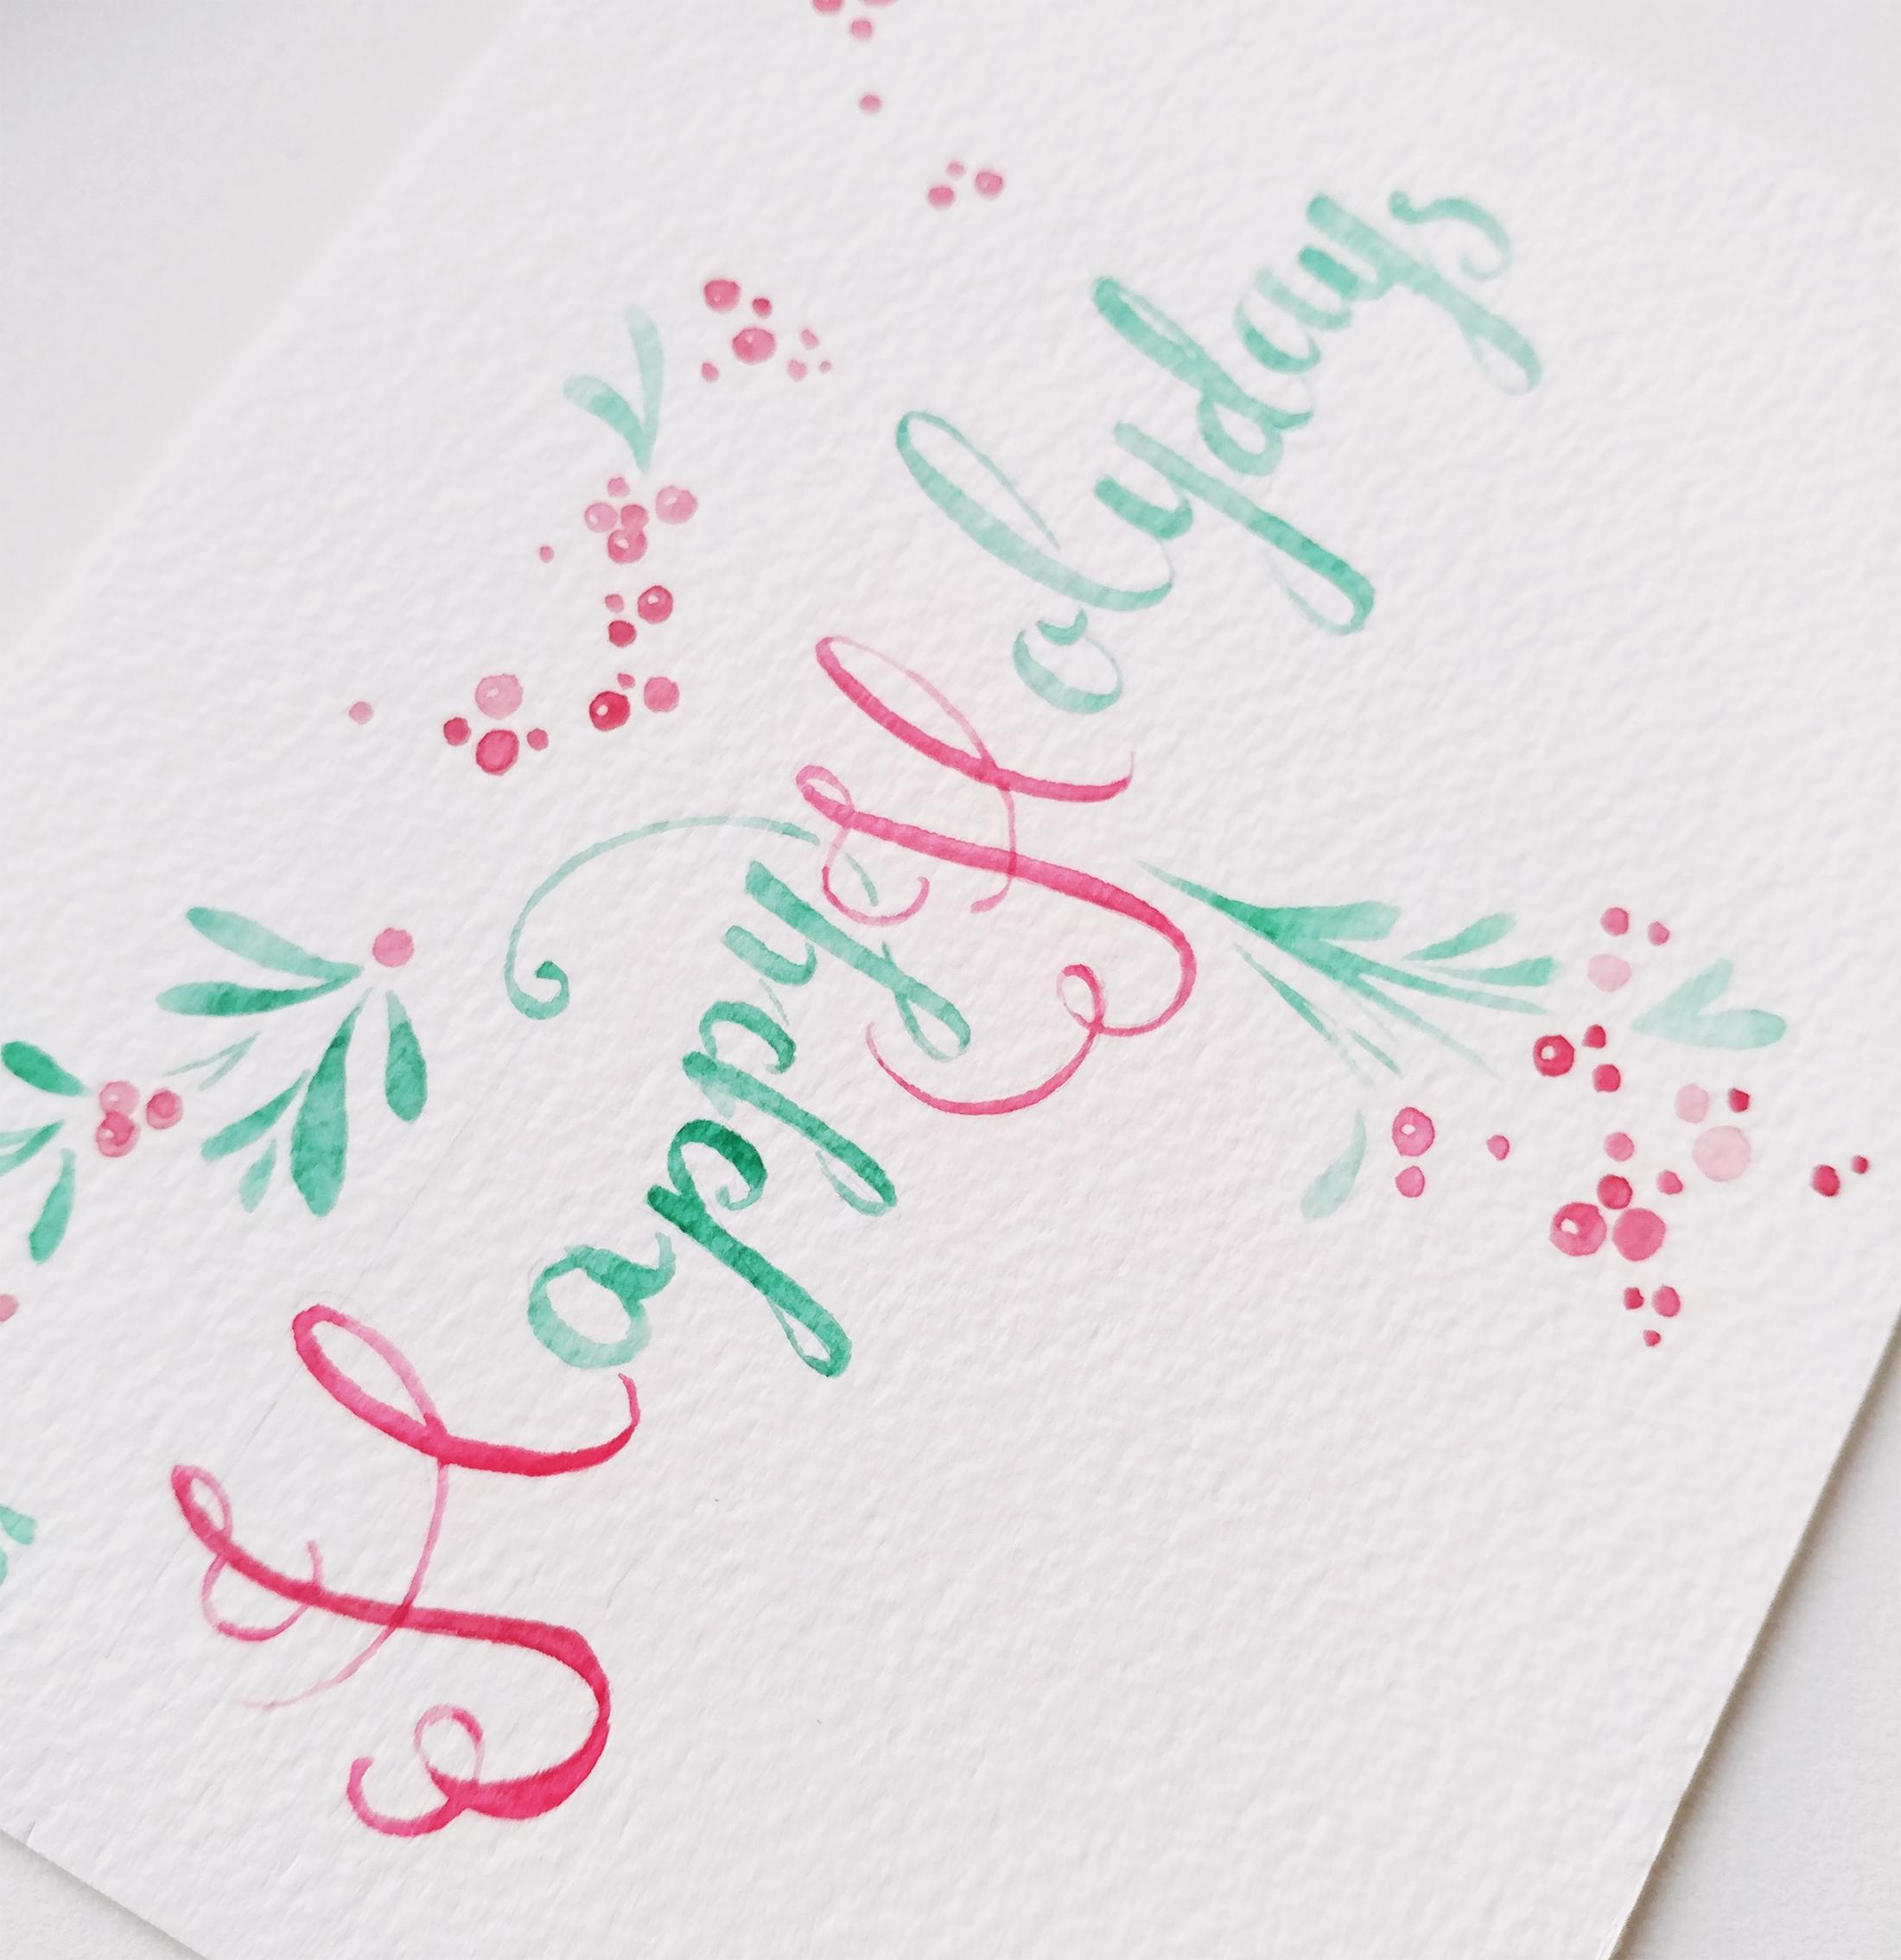 happy-holidays-calligraphy-practice.jpg